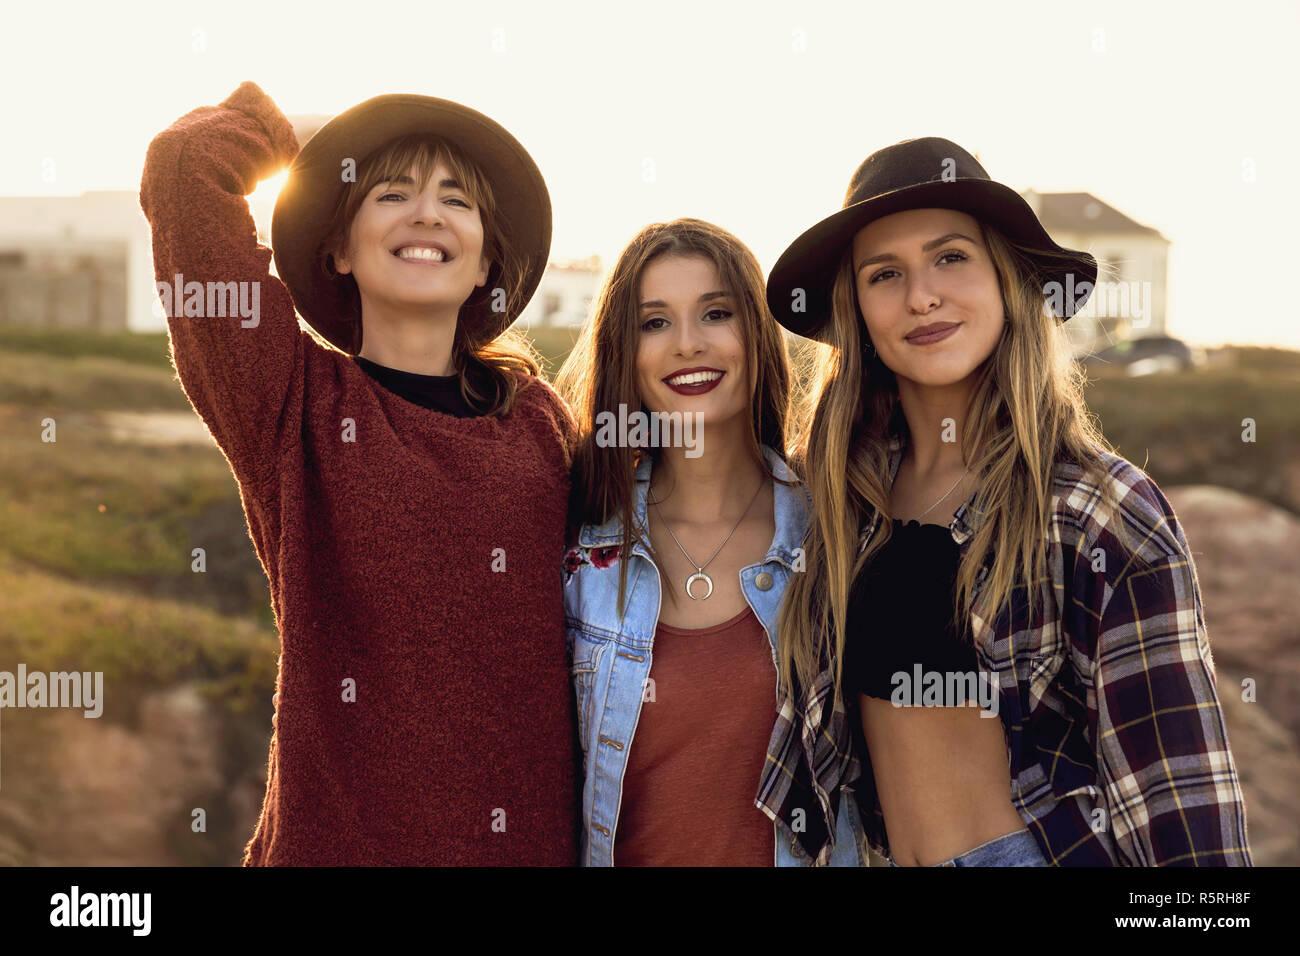 Three Best Friends Near The Coastline Having A Good Time Stock Photo Alamy